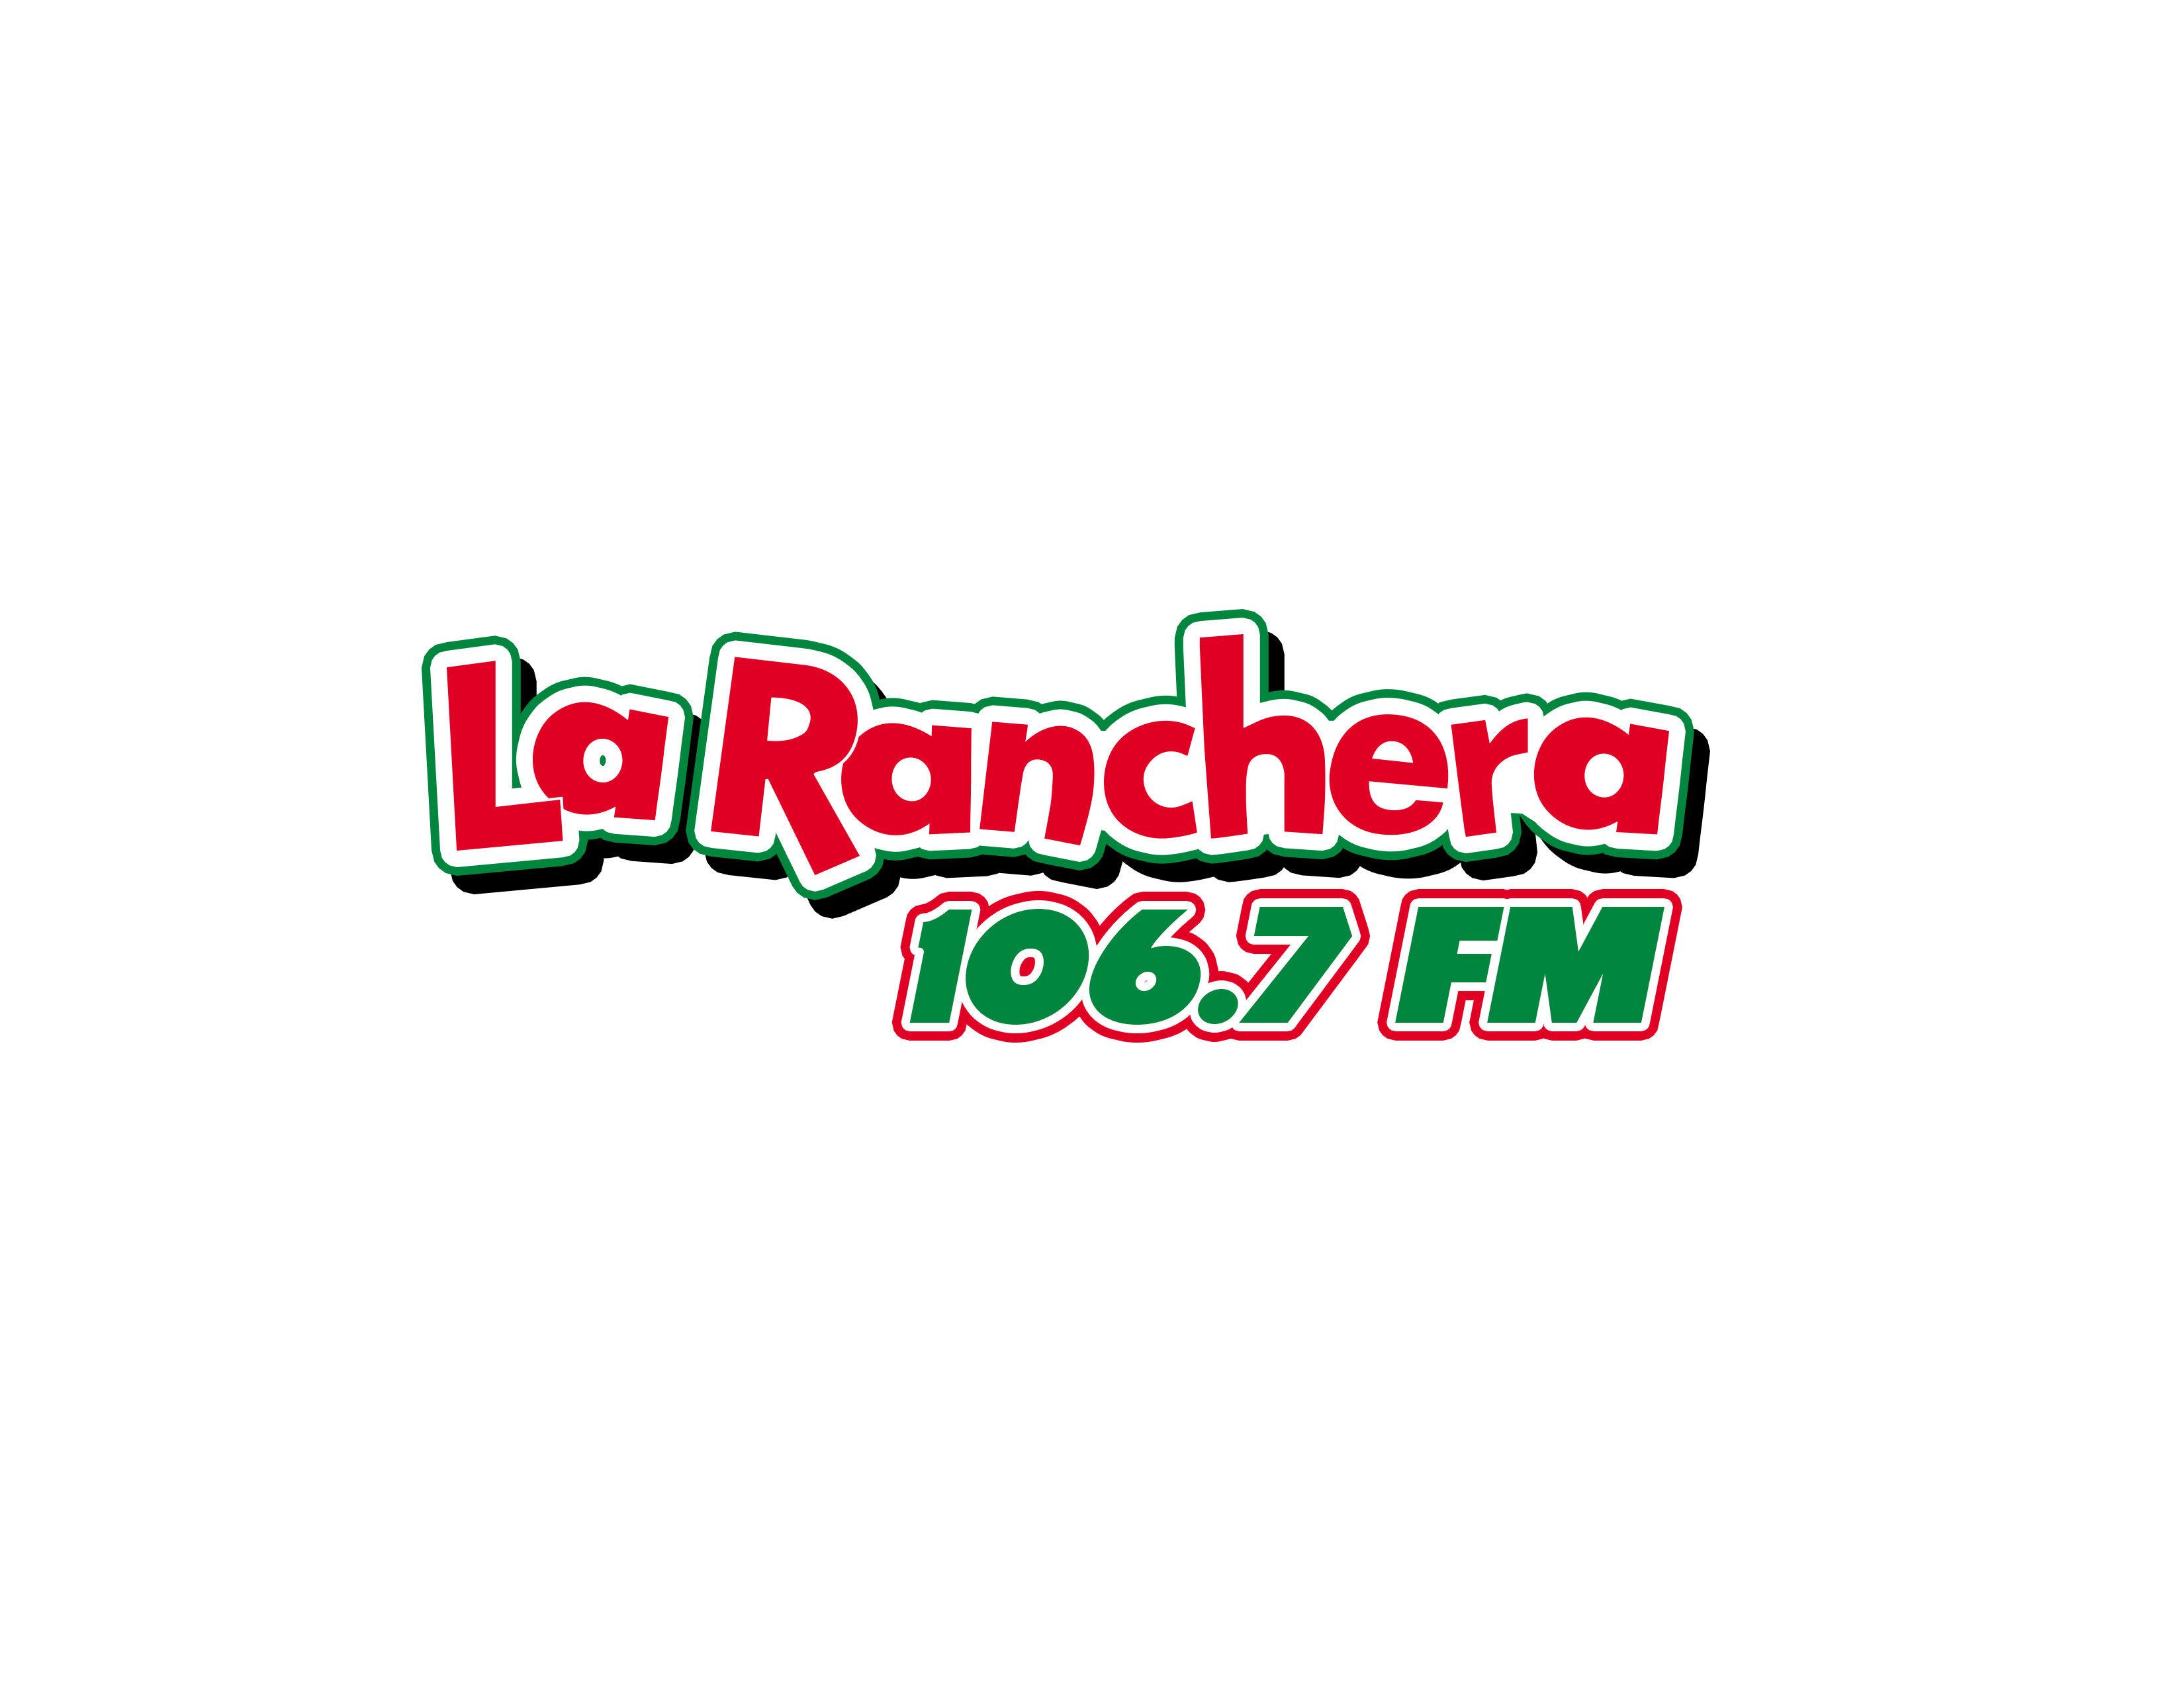 La Ranchera 96.7FM